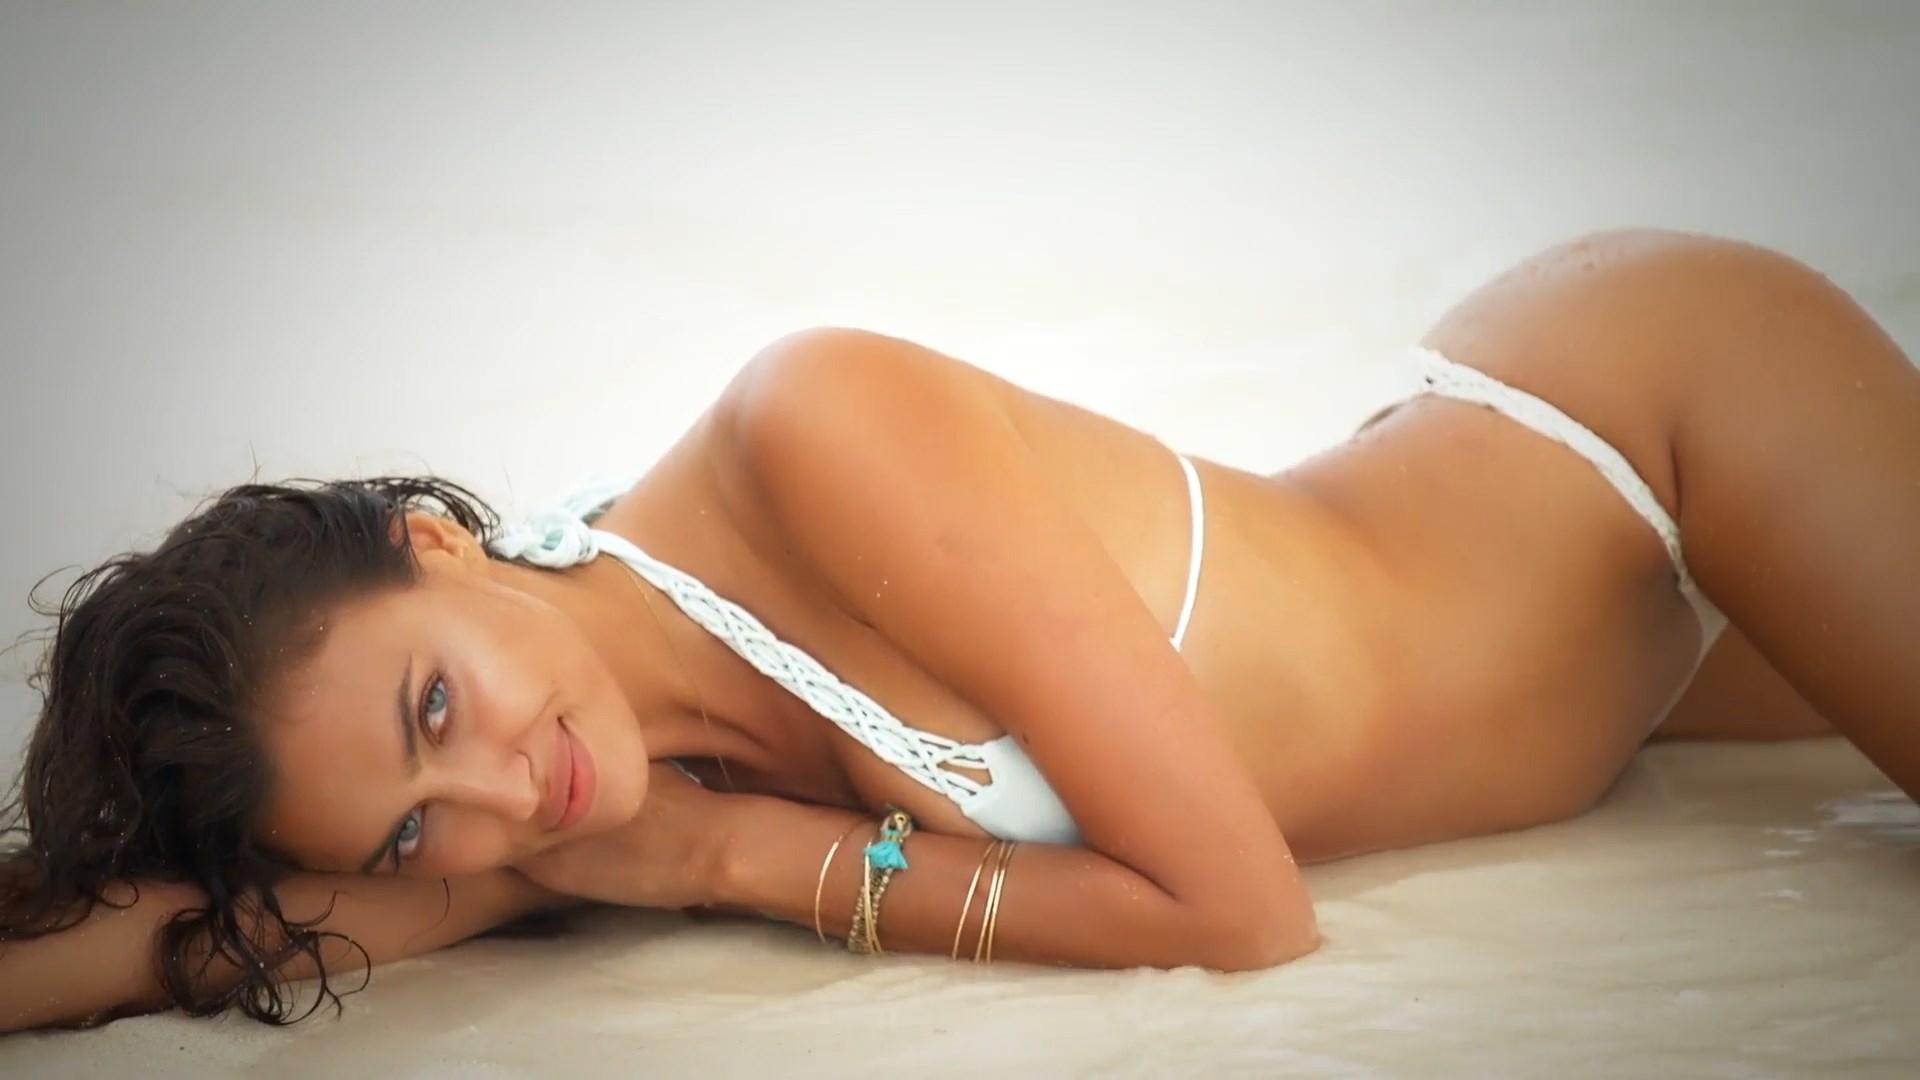 Irina Shayk shaved pussy